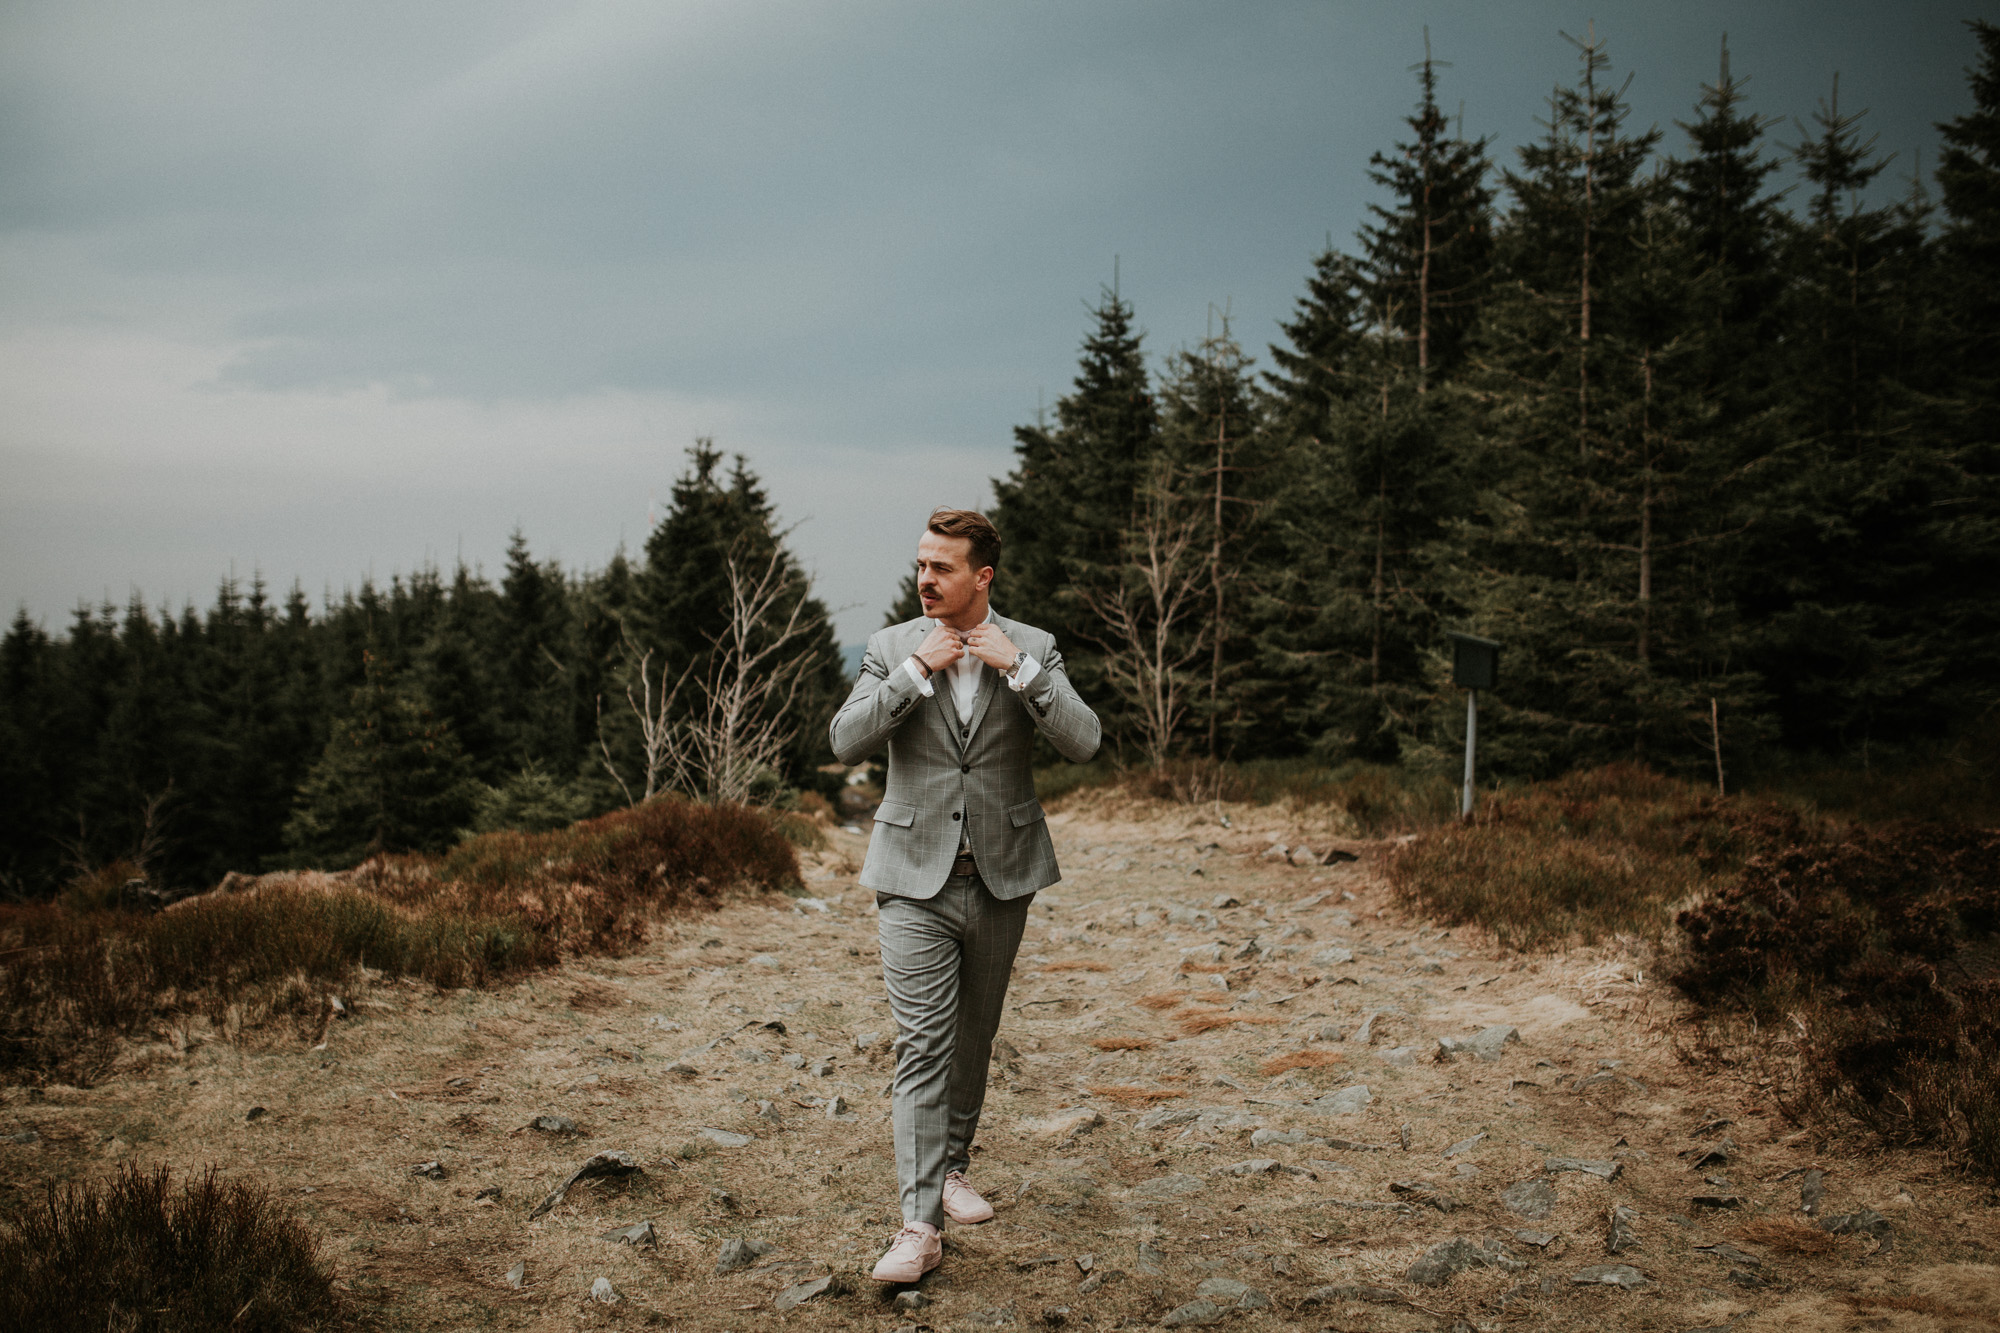 DanielaMarquardtPhotography_Hochzeitsfotograf_Düsseldorf_Köln_Mallorca_Bayern_Austria_Harz_LinaundMaik_Afterwedding-Shooting_Weddingphotographer_Ibiza_Tuskany_Italien_Toskana96